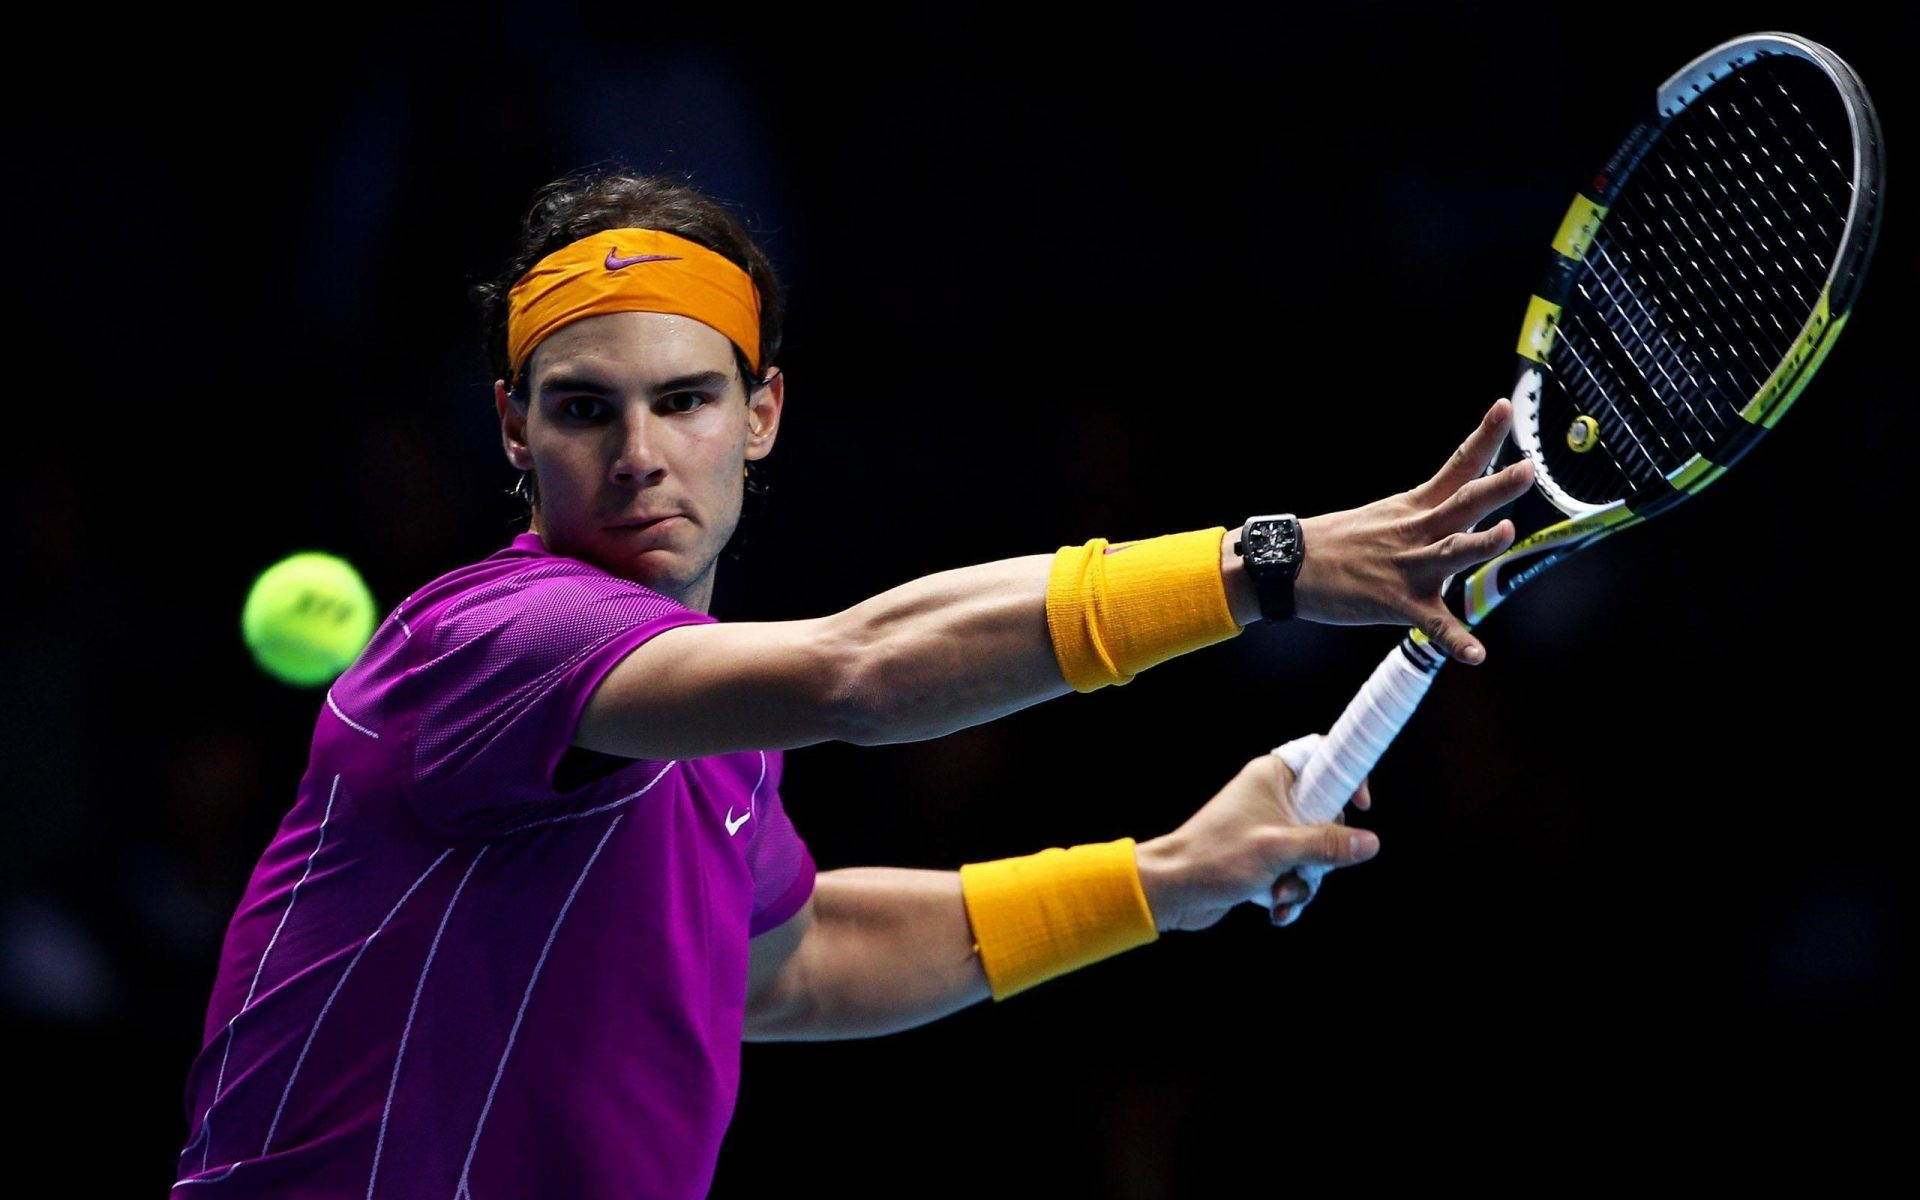 20 Time Grand Slam Champion Rafael Nadal